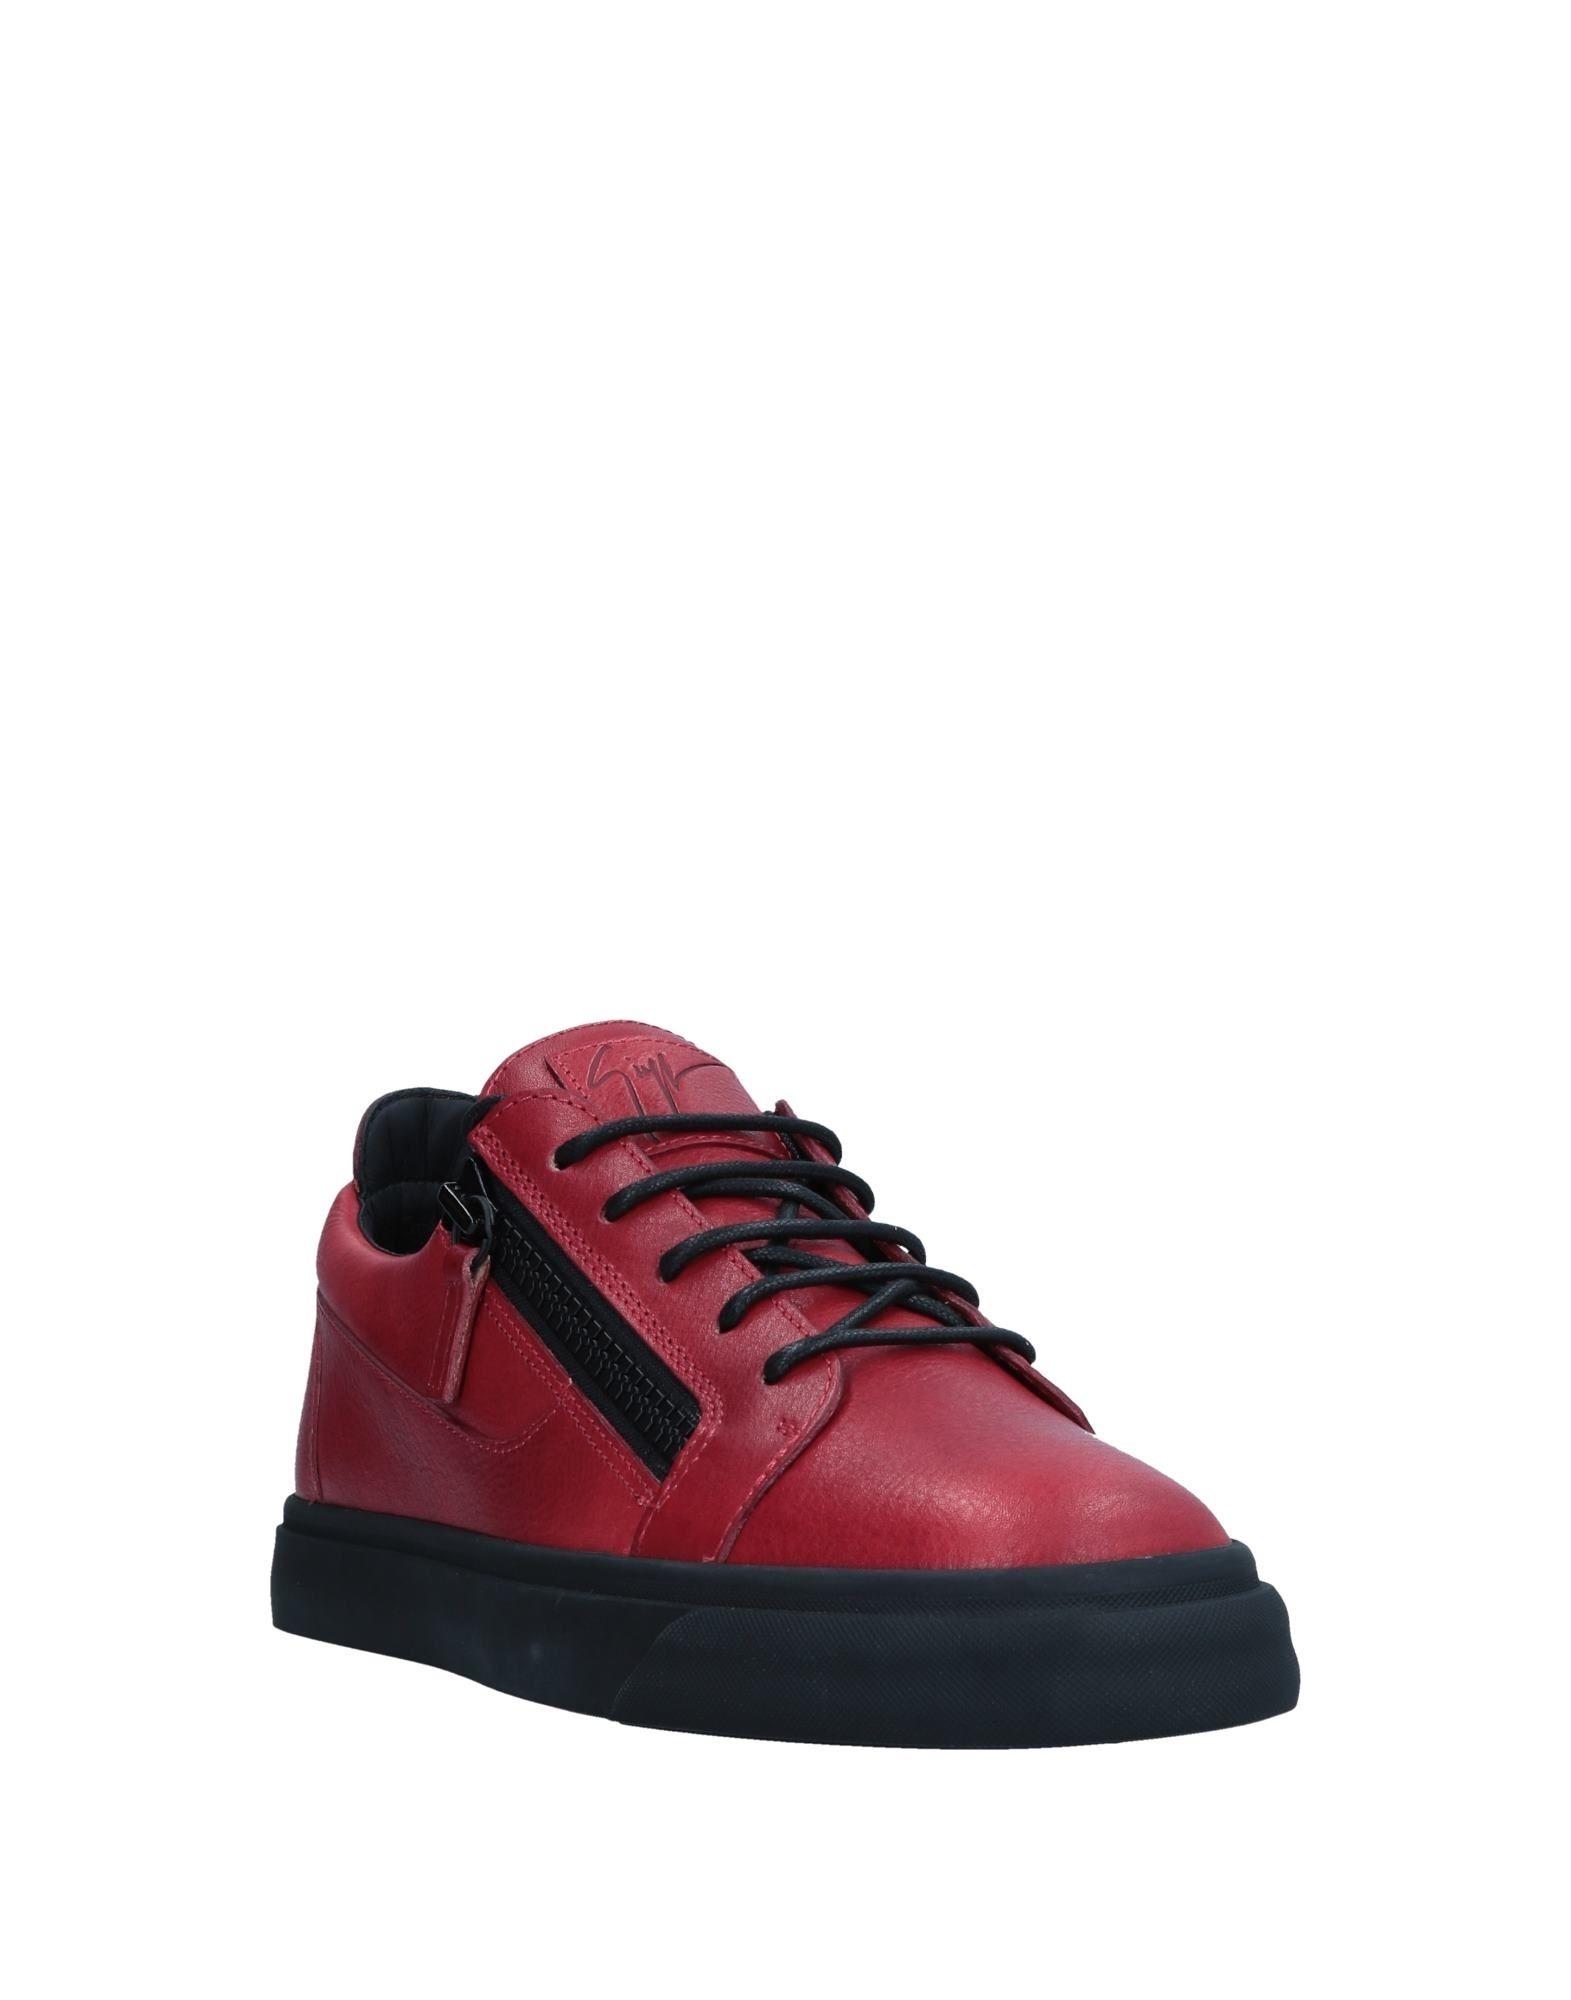 Giuseppe Zanotti Sneakers Herren  11545493GF 11545493GF  d1b40c